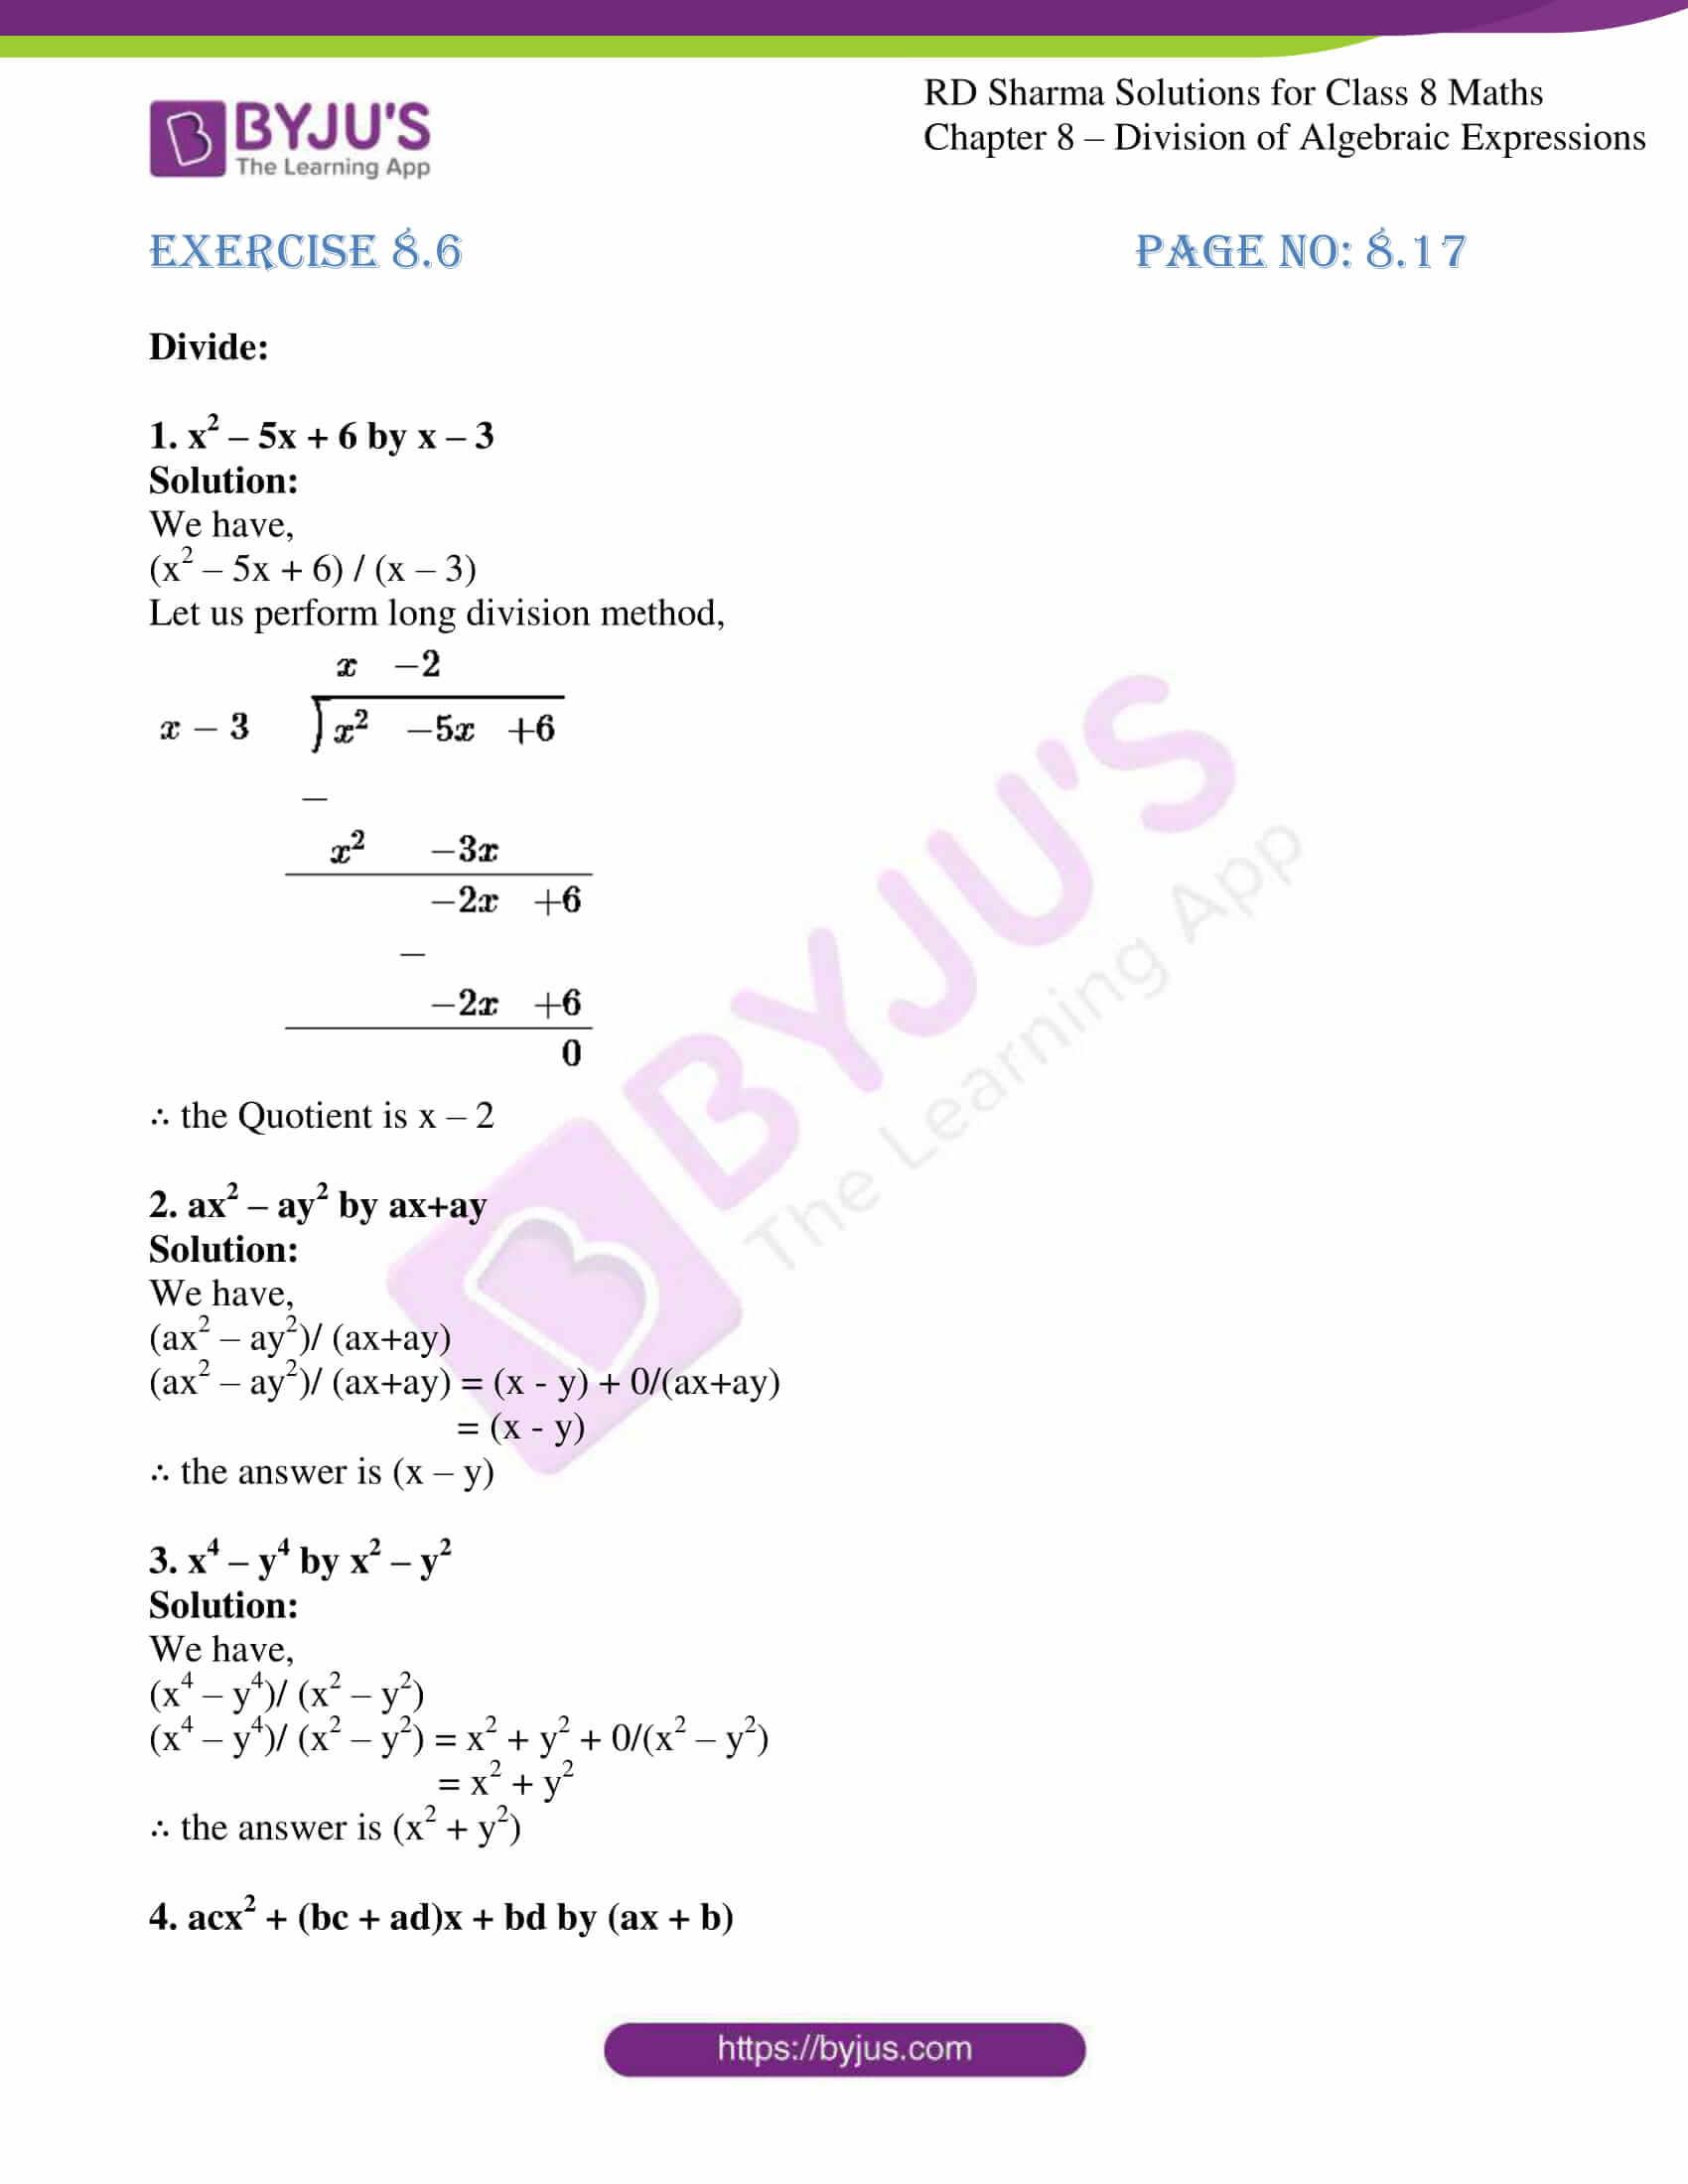 rd sharma class 8 maths chapter 8 exercise 6 1